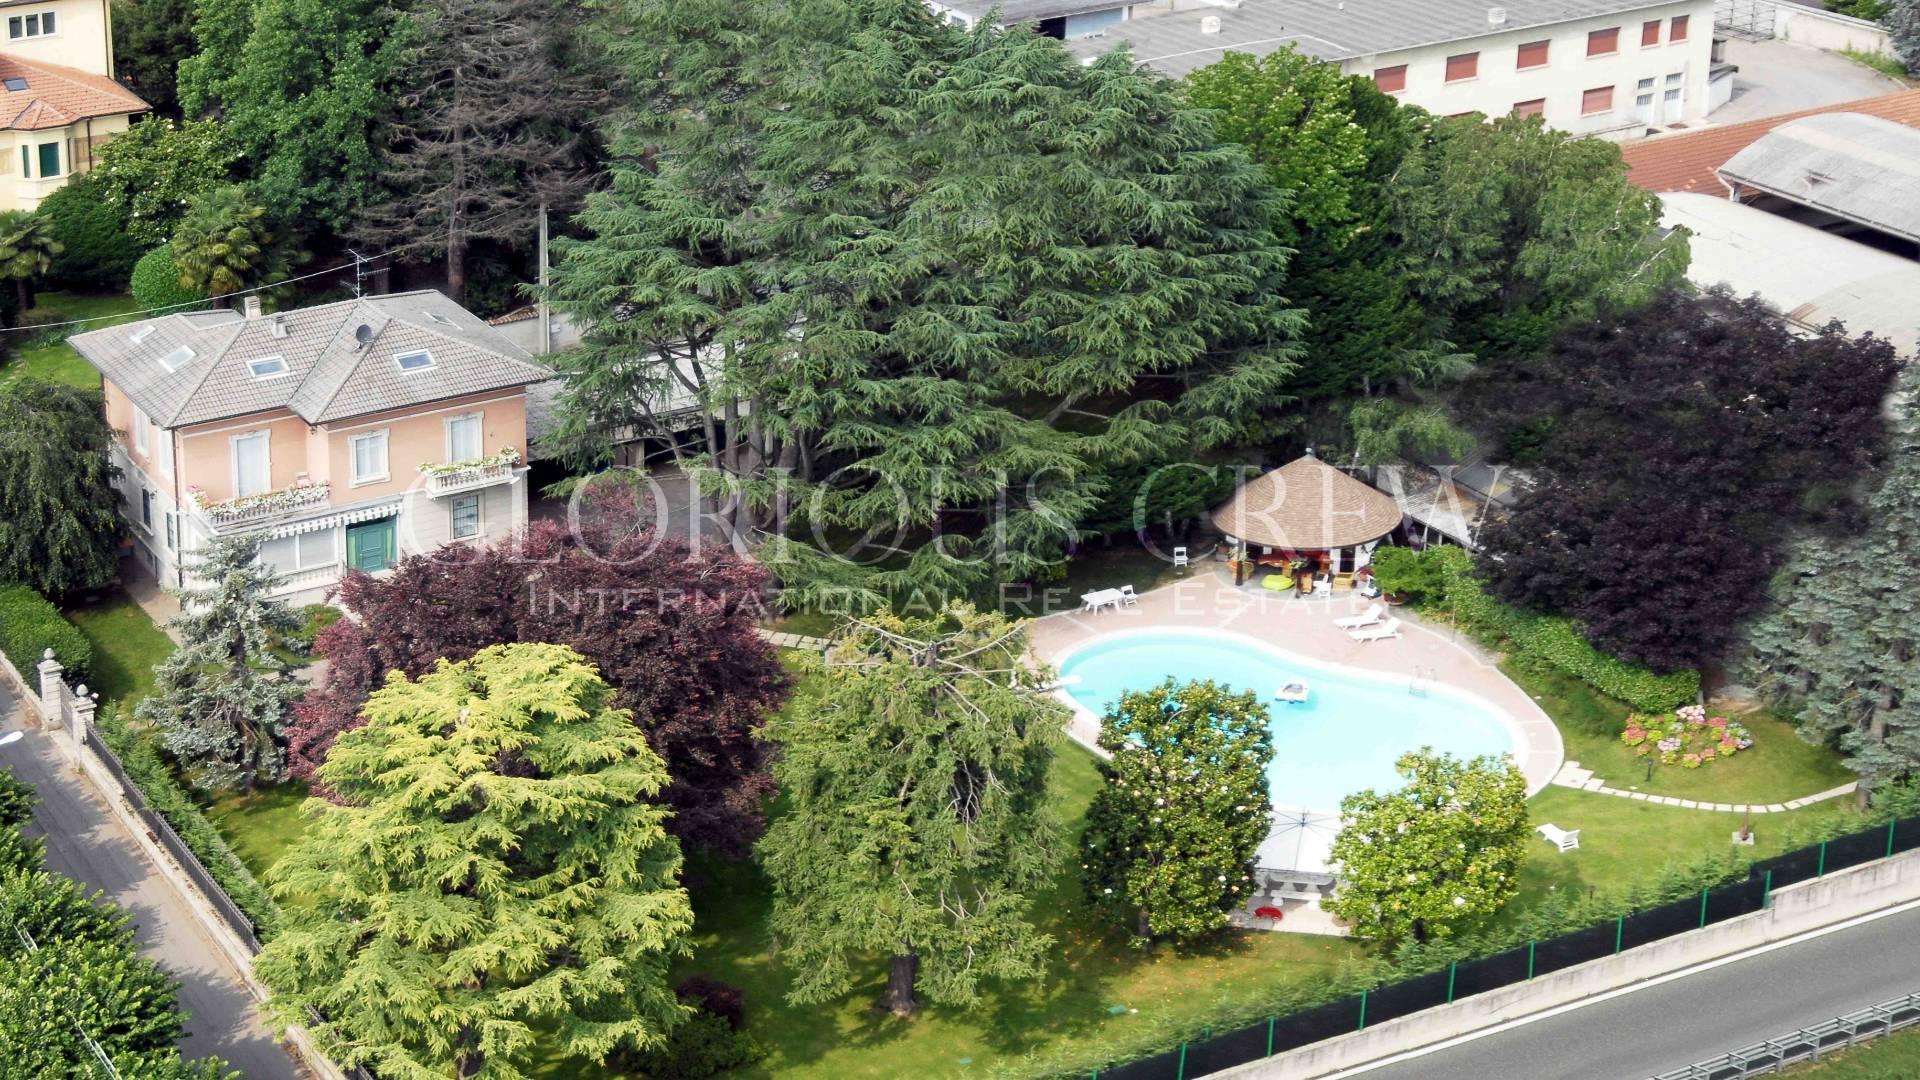 Villa in Vendita a Solbiate Arno:  5 locali, 378 mq  - Foto 1